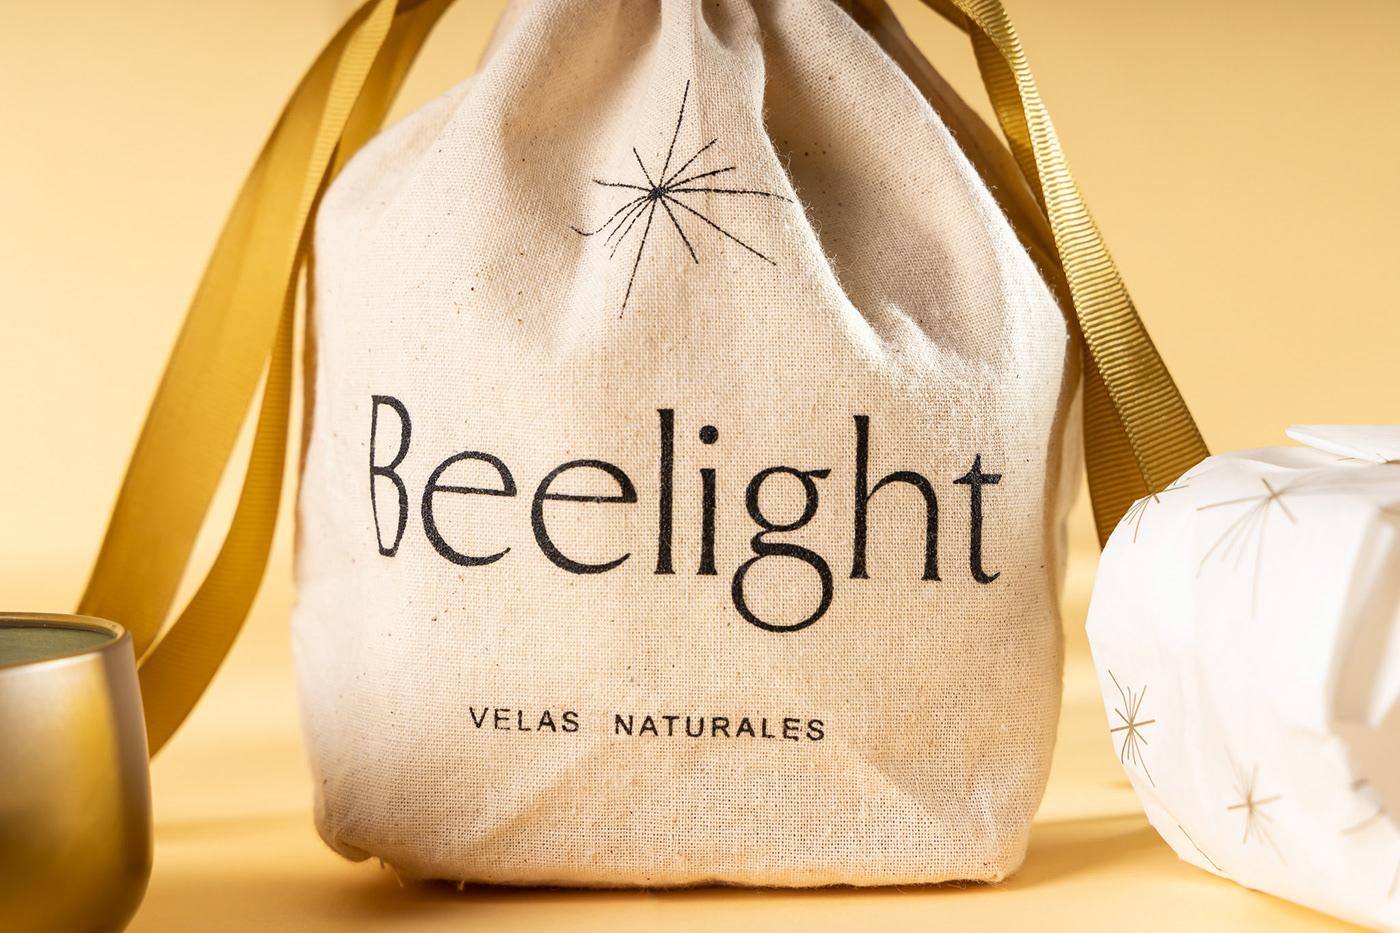 Thumbnail for Beelight's Branding System Shines Bright